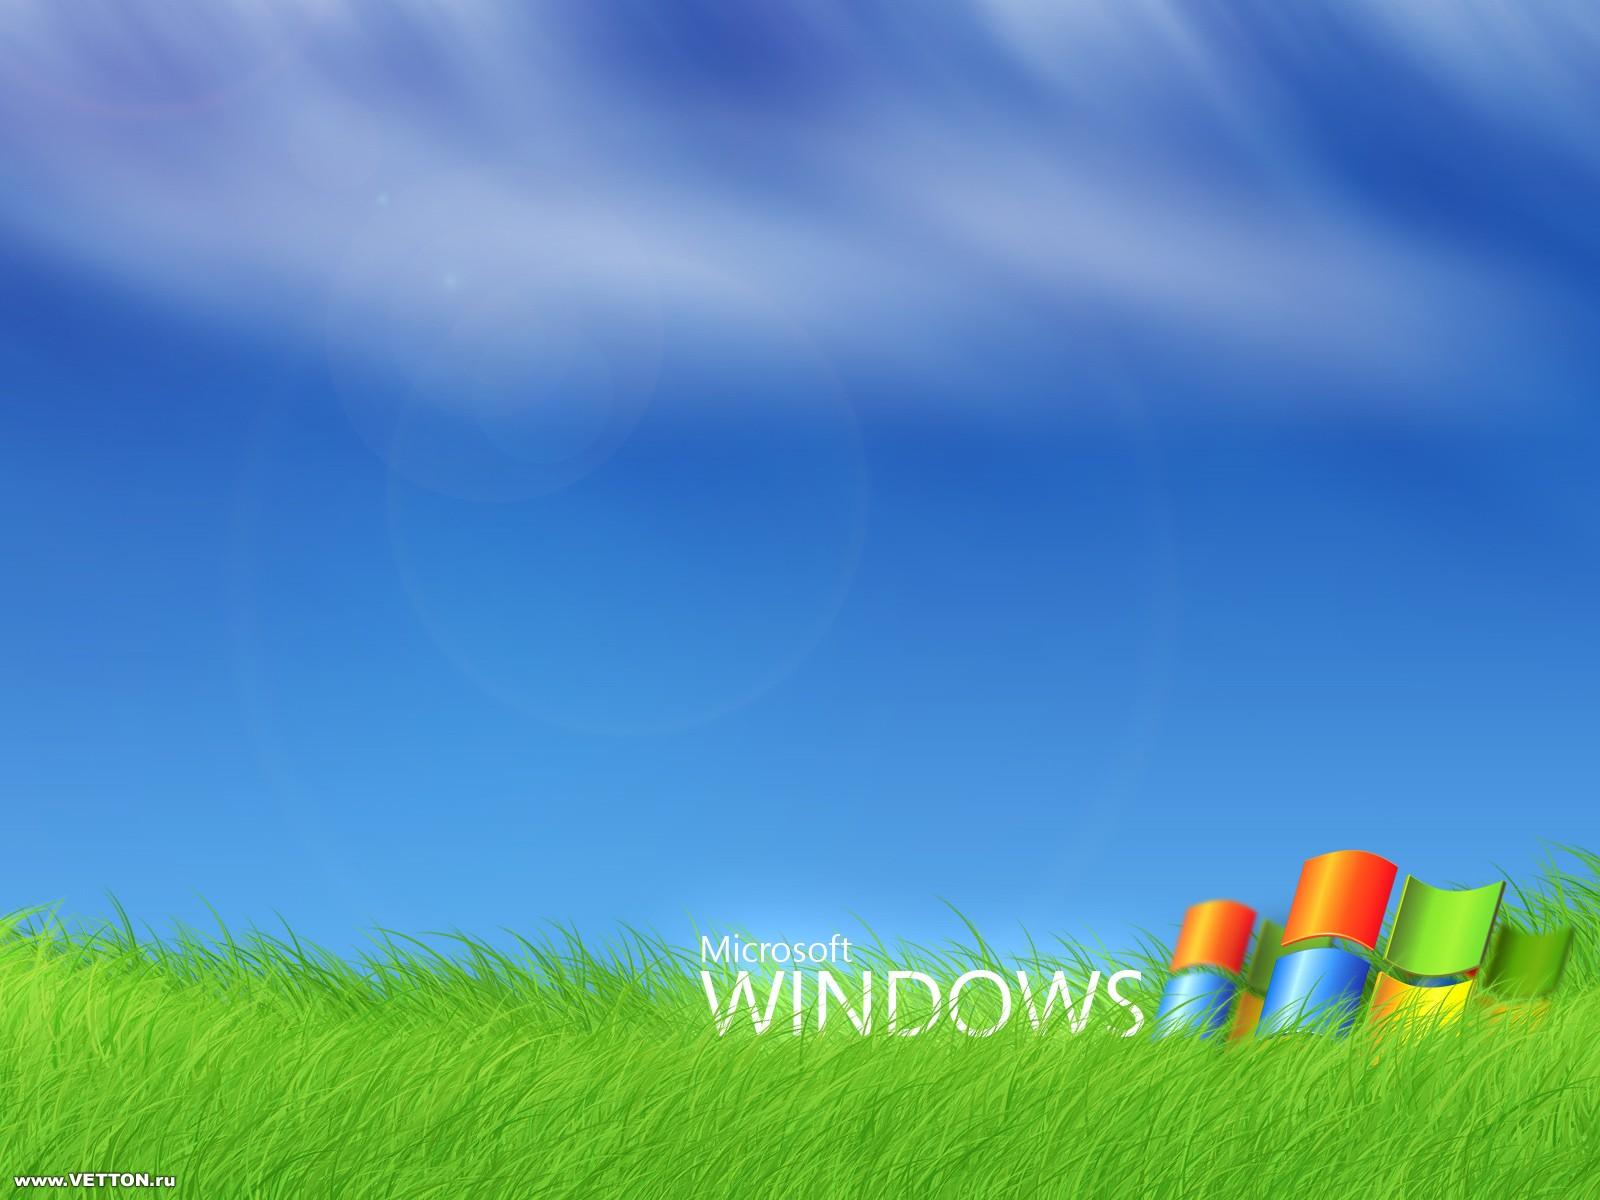 xp wallpapers windows7windows8 xp7 - photo #33